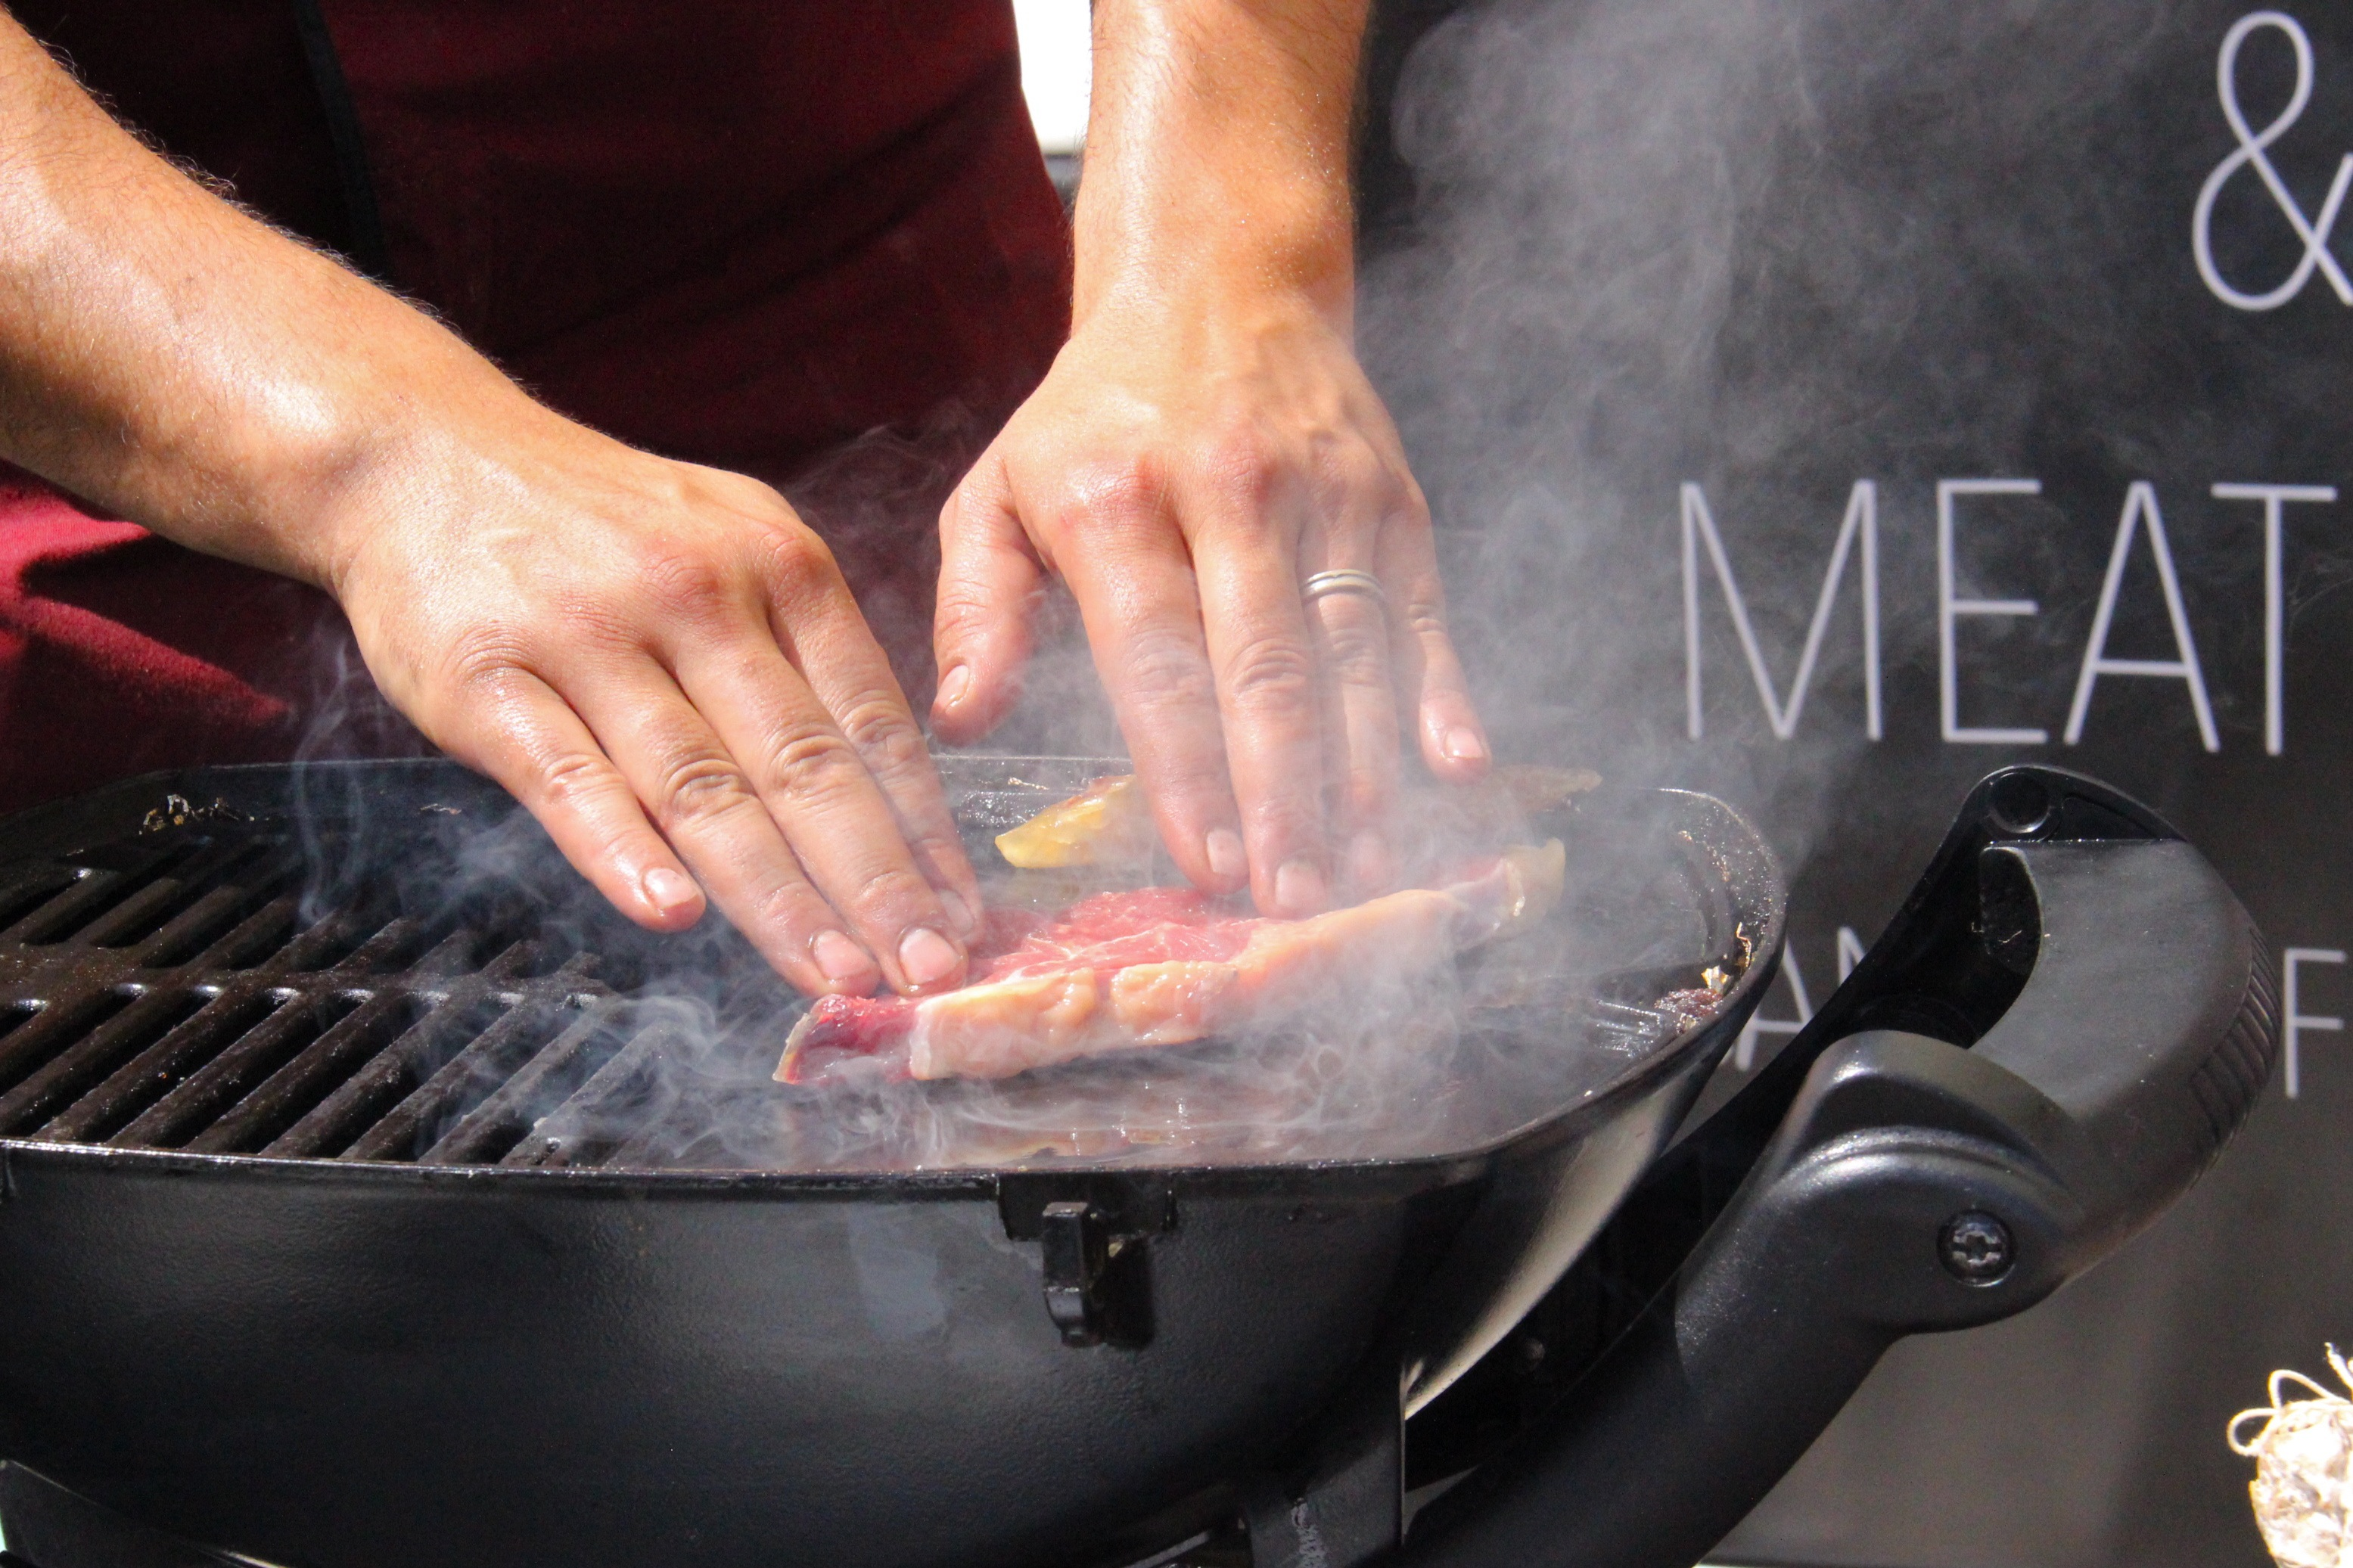 Cuisson de viande à la plancha